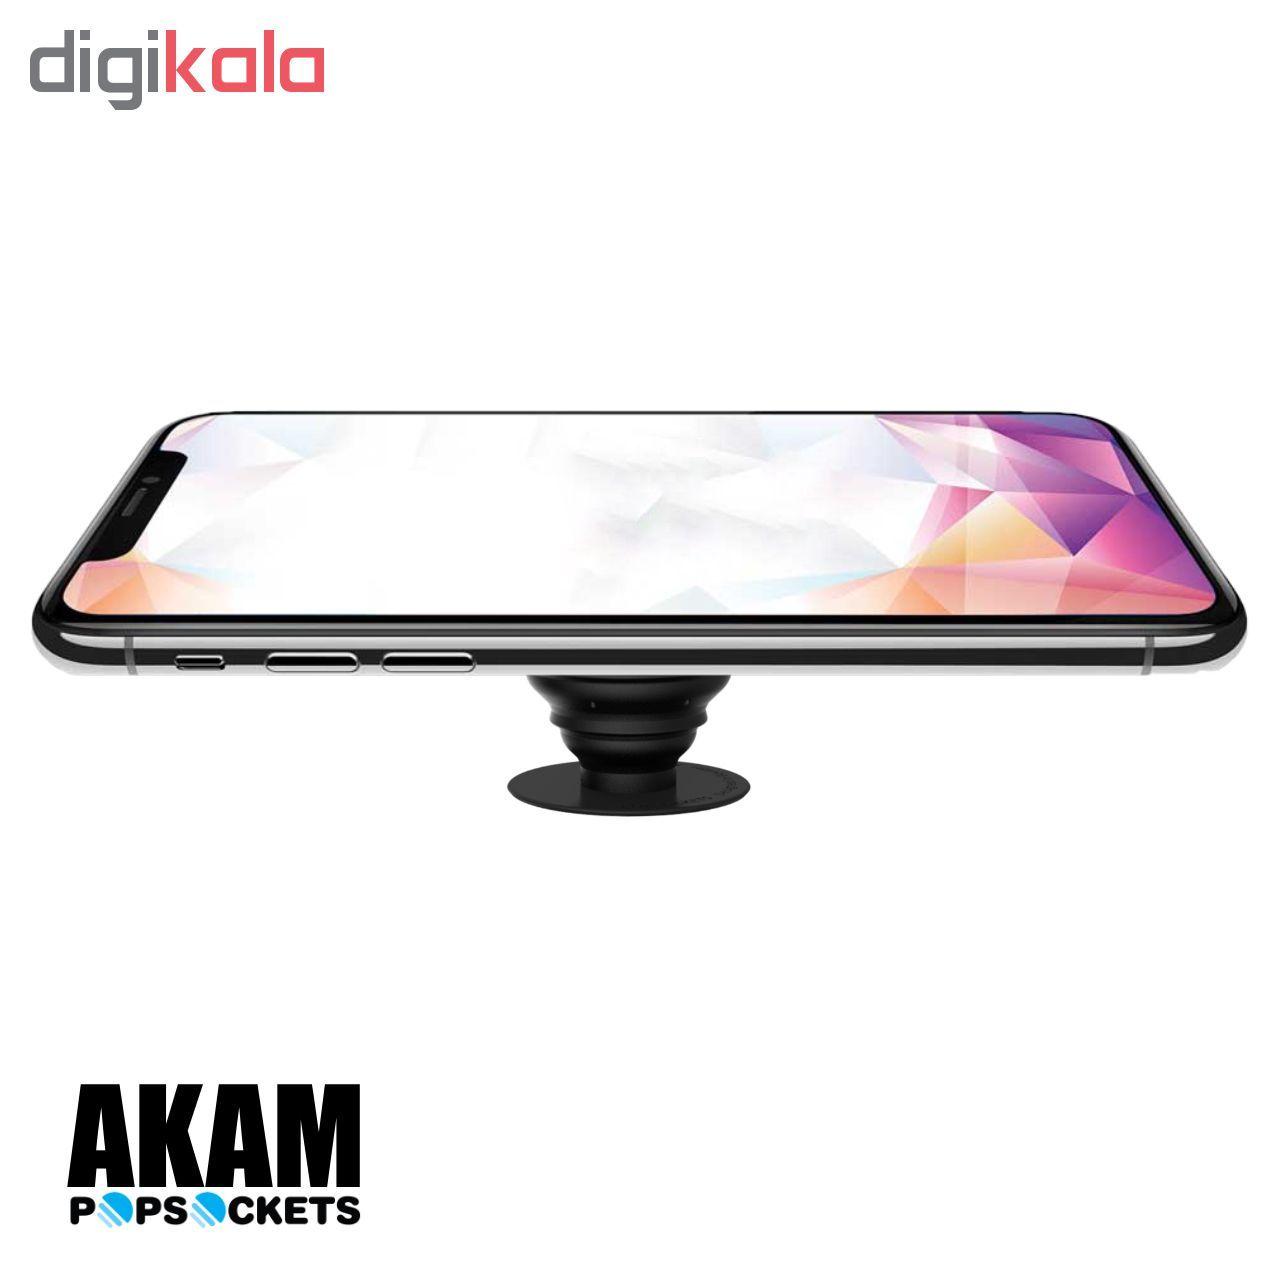 پایه نگهدارنده گوشی موبایل پاپ سوکت آکام مدل APS0211 main 1 9